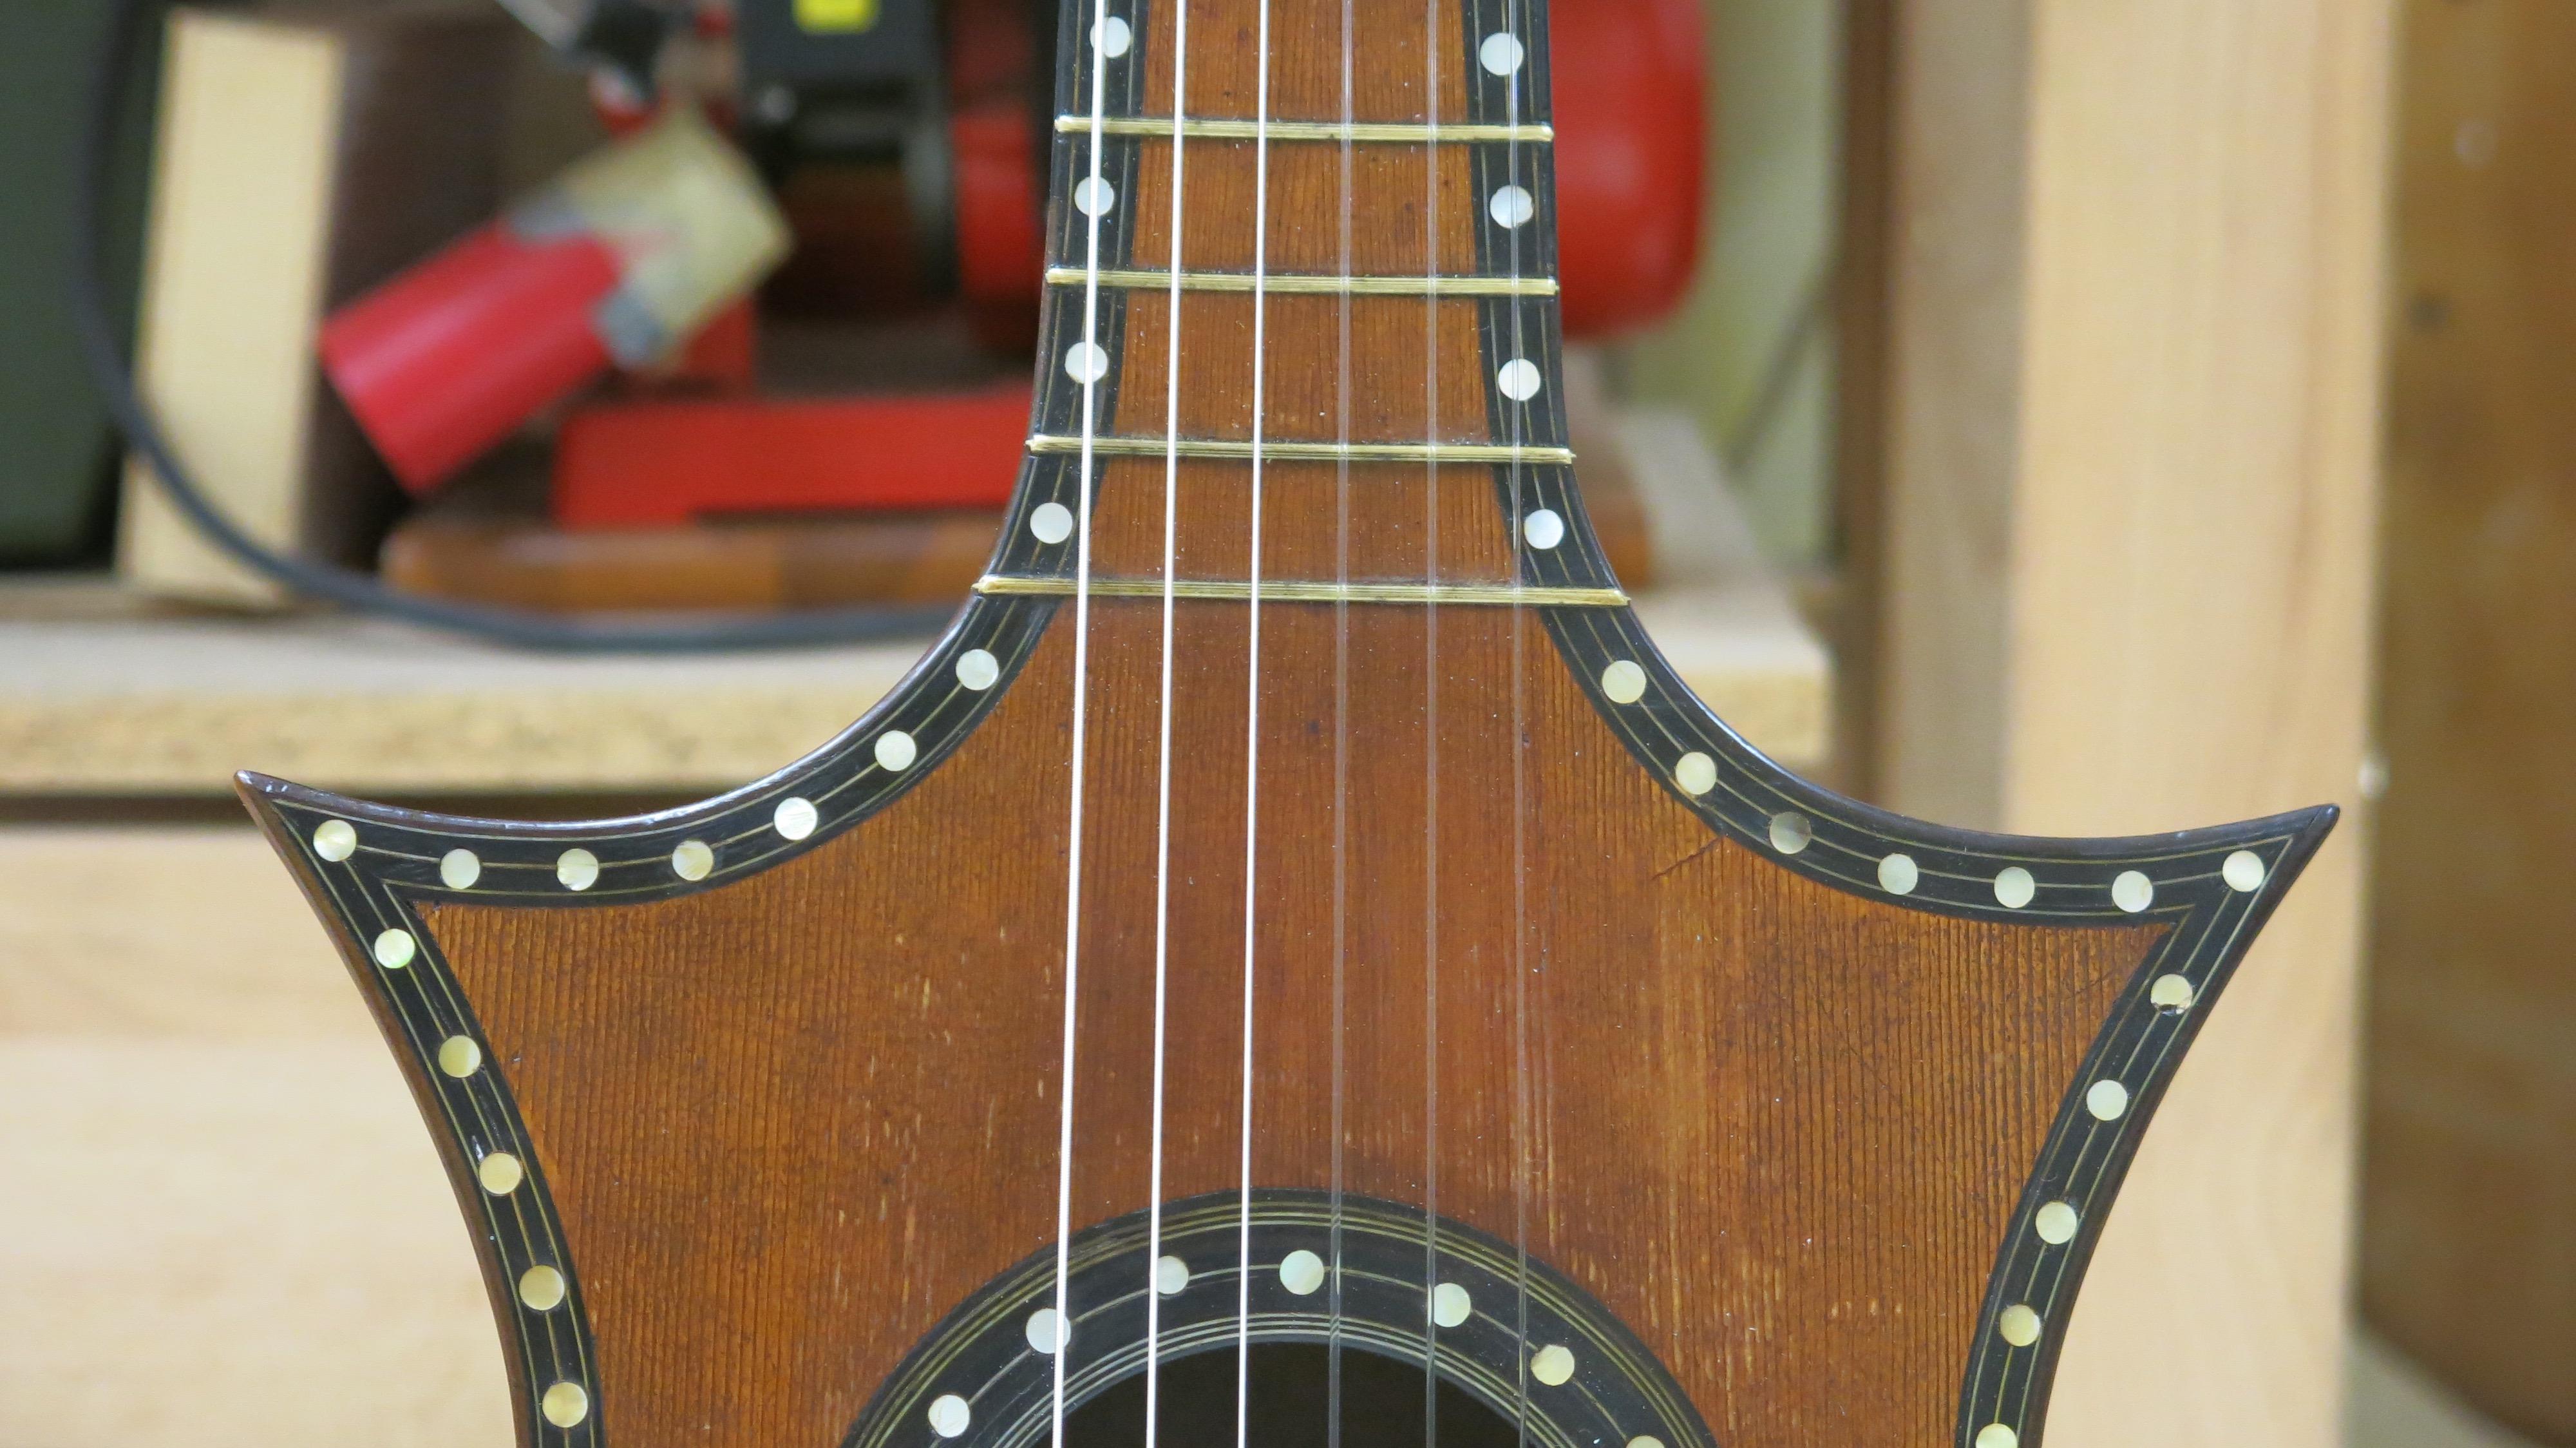 Restauration guitare romantique J.L Mast Mirecourt 1850